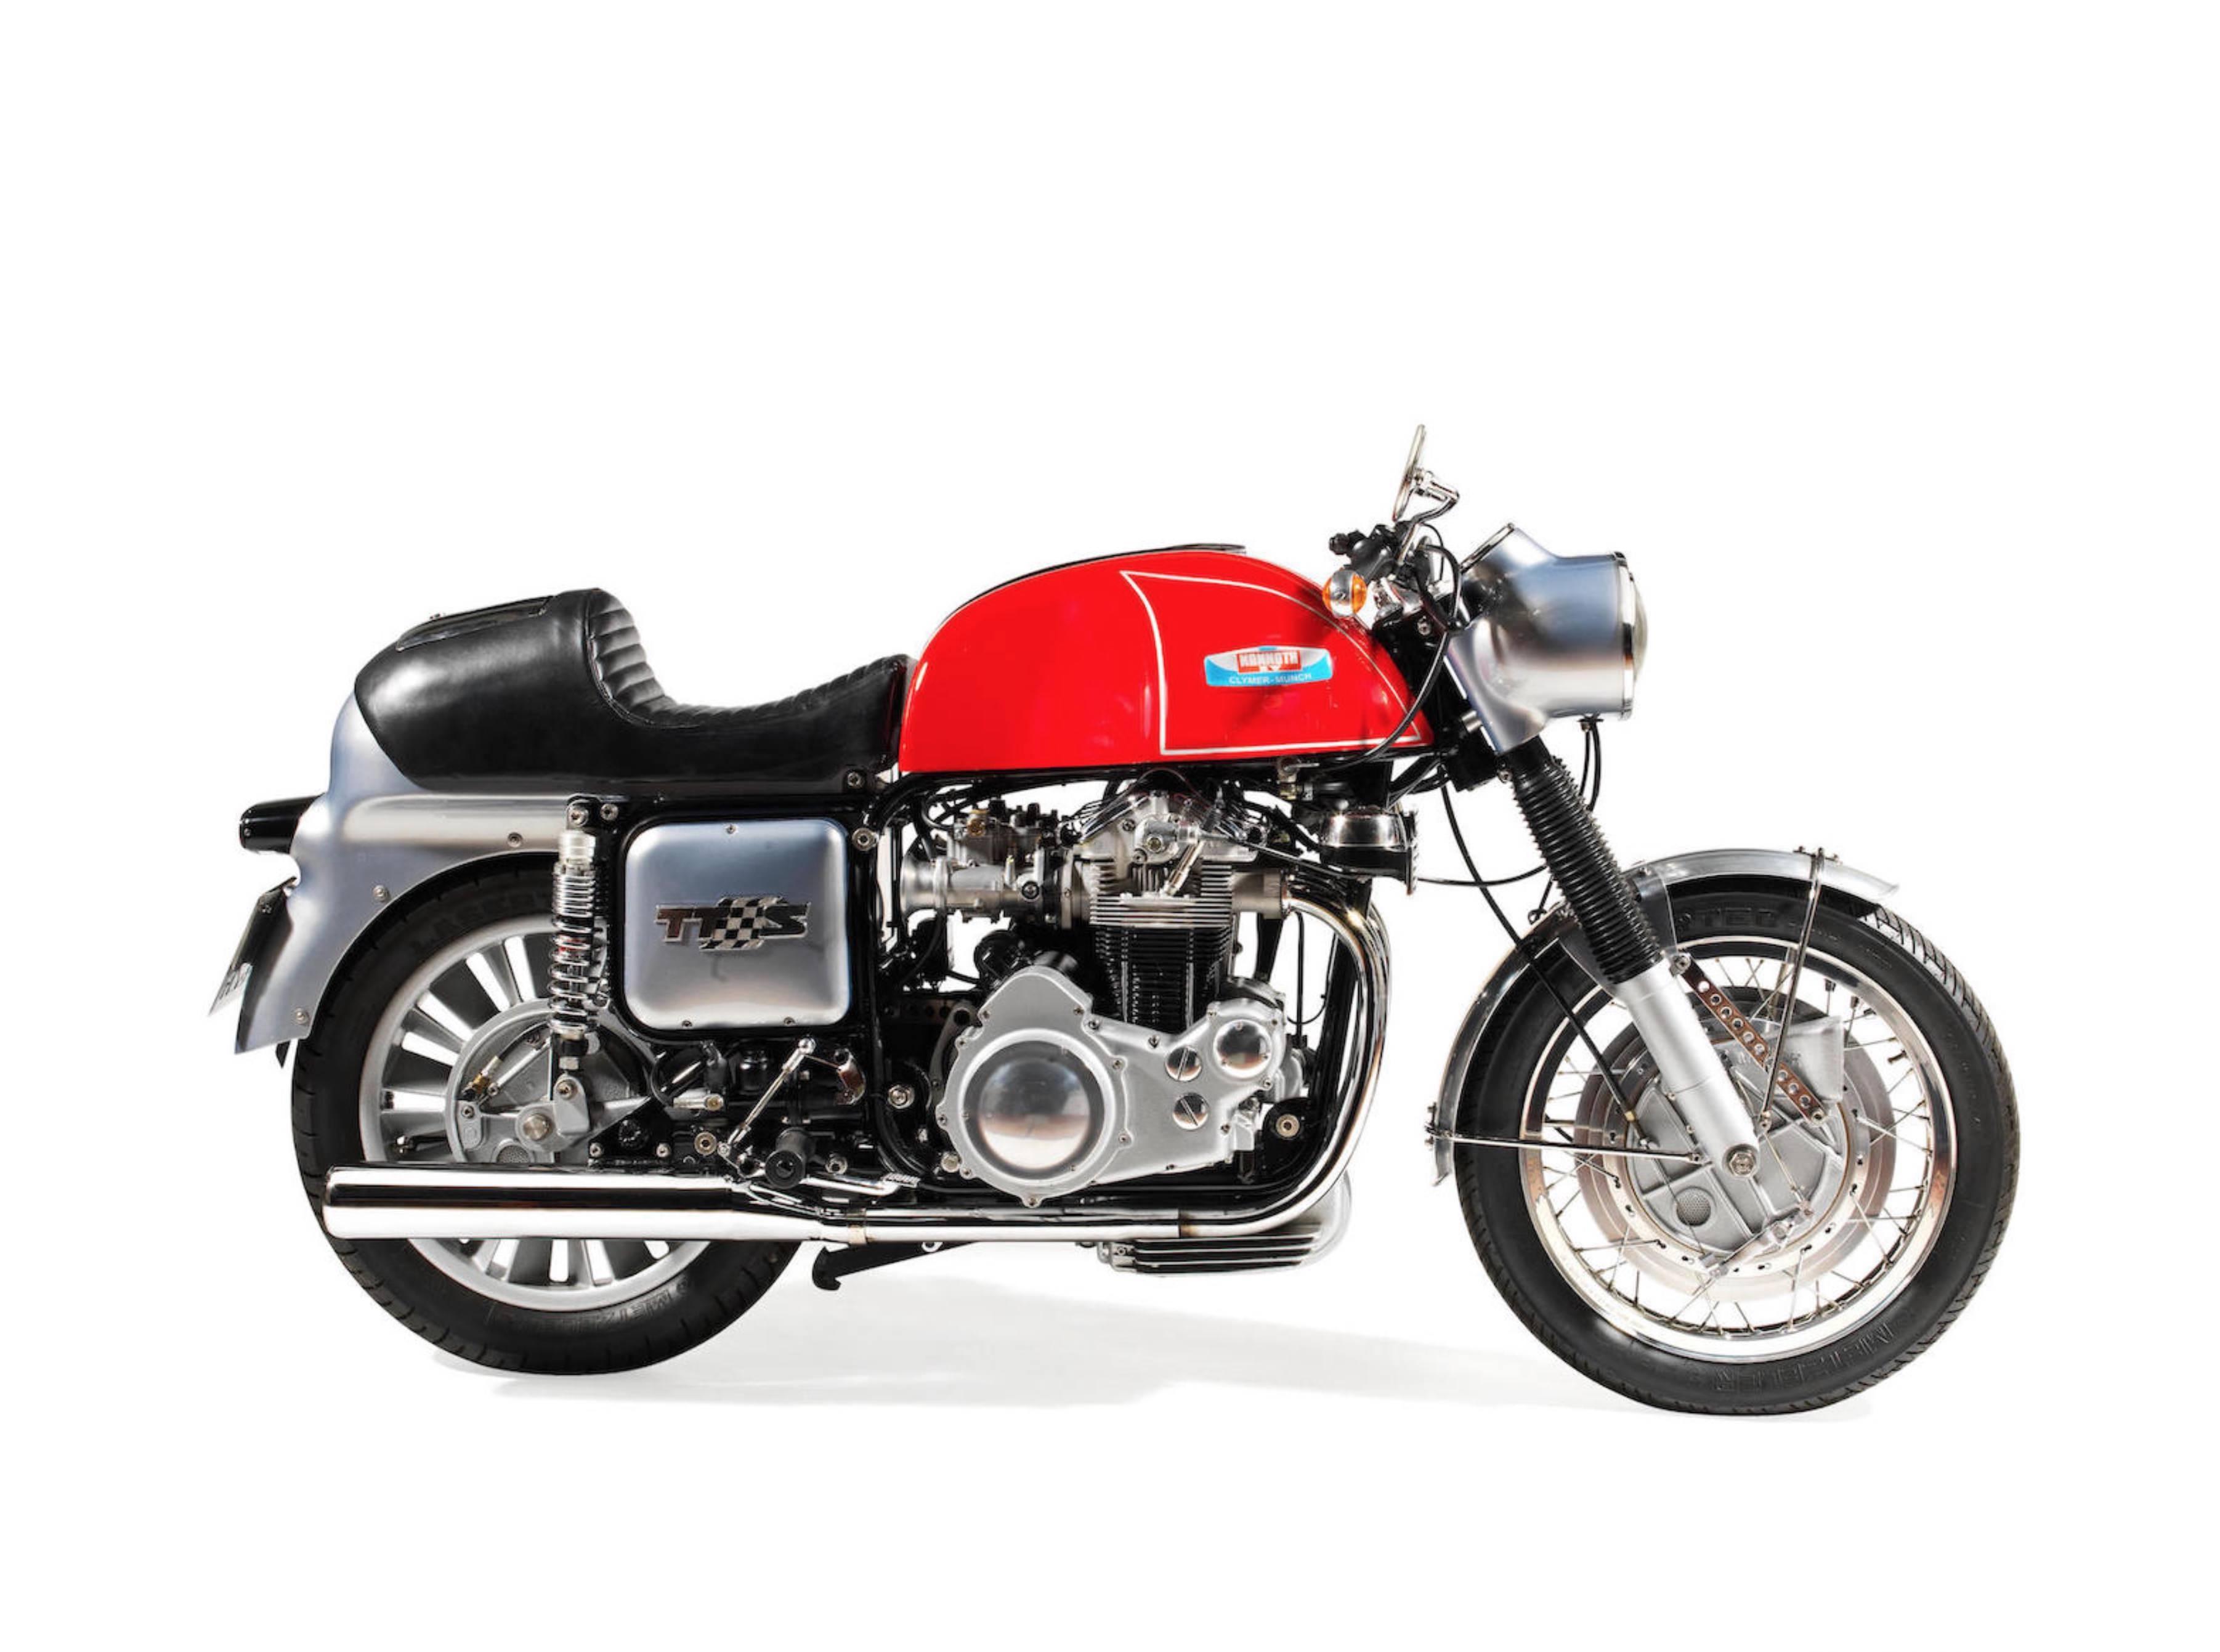 The Munch Mammoth - A Rare 140mph 1200cc Superbike